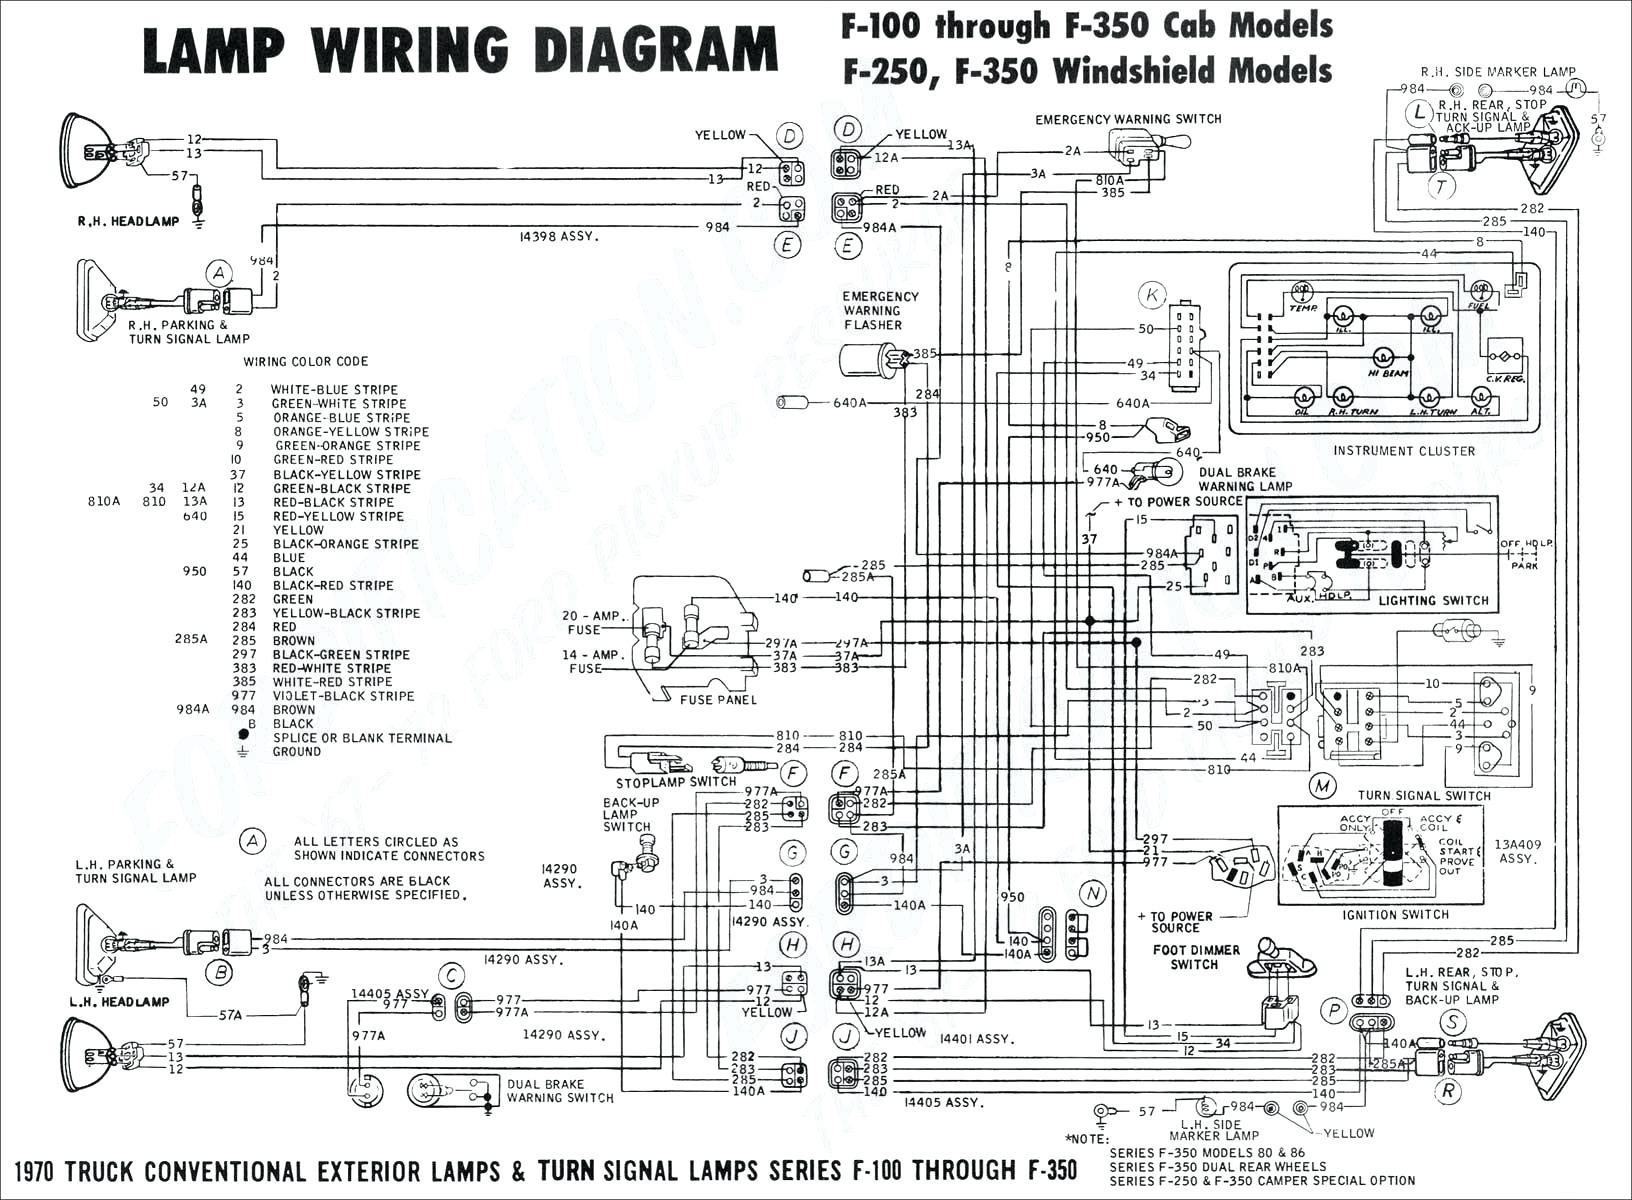 1996 Yamaha 400 Kodiak Wiring From Battery Terminal 1996 Cavalier Alternator Wiring Diagram Of 1996 Yamaha 400 Kodiak Wiring From Battery Terminal